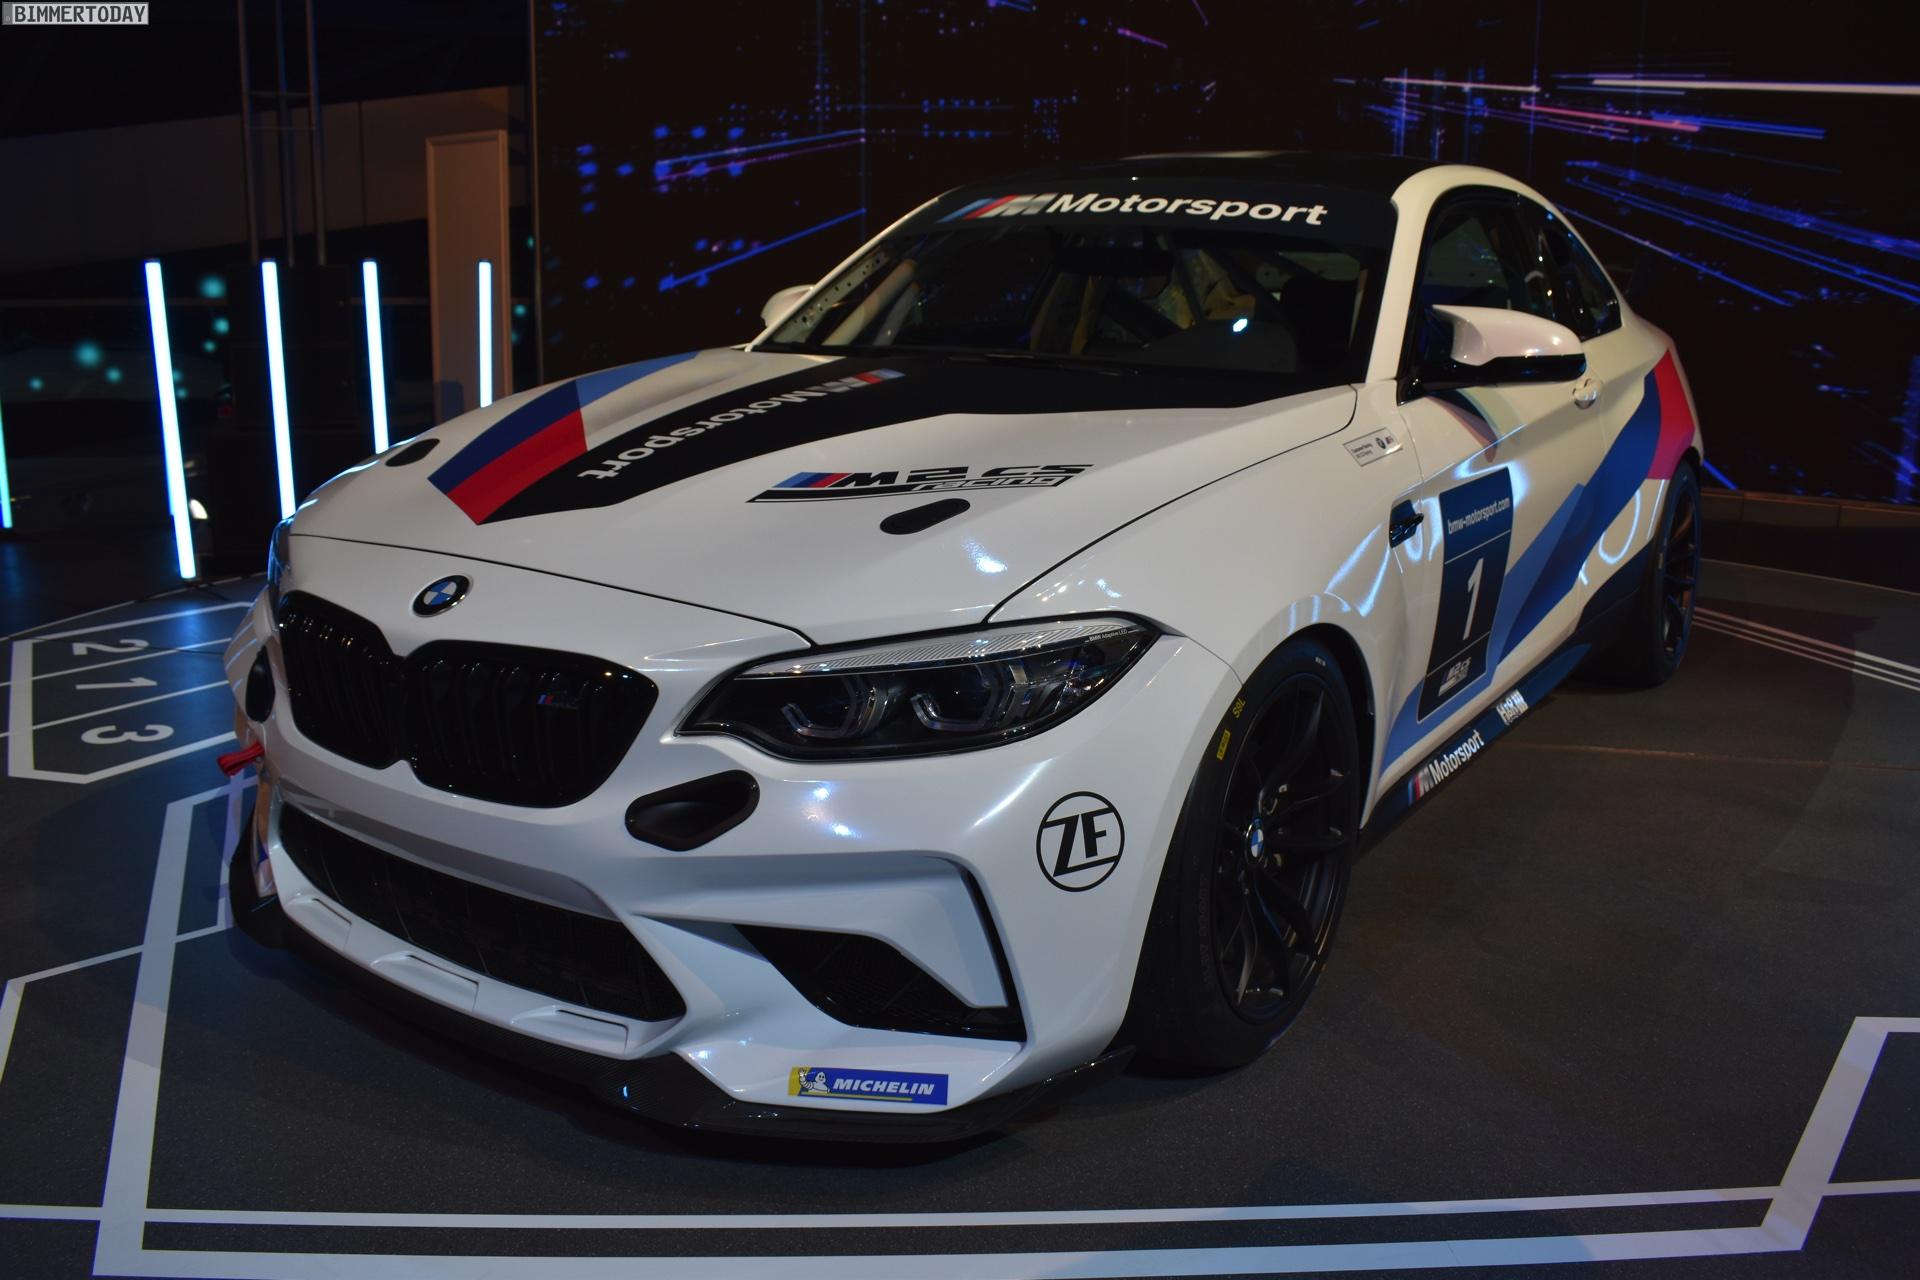 Bmw M2 Cs Racing Erste Live Fotos Vom Kundensport F87